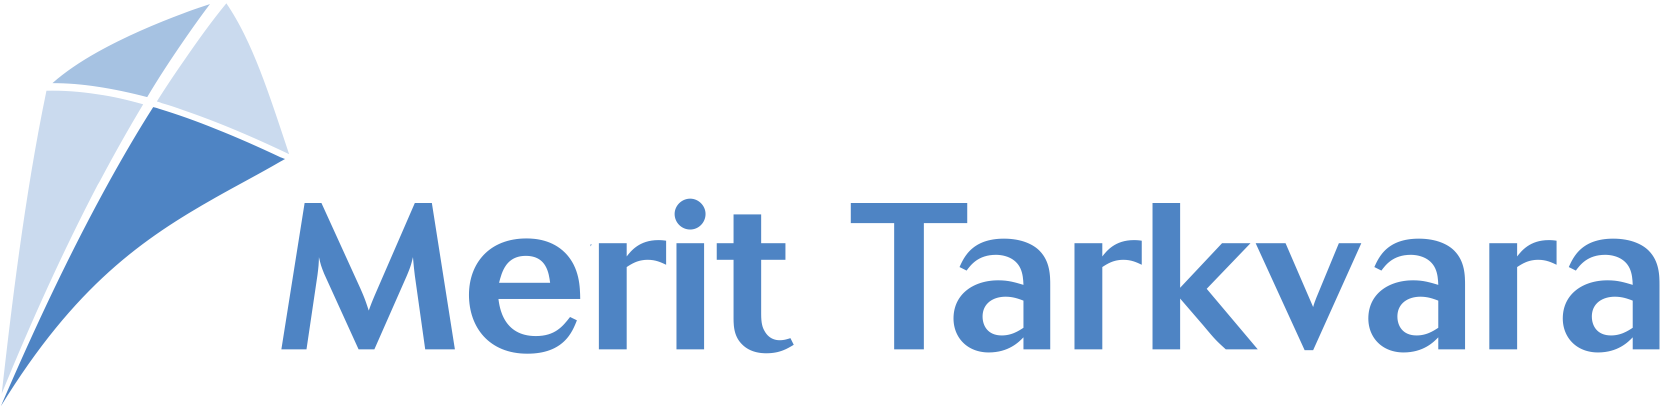 Image result for merit tarkvara logo